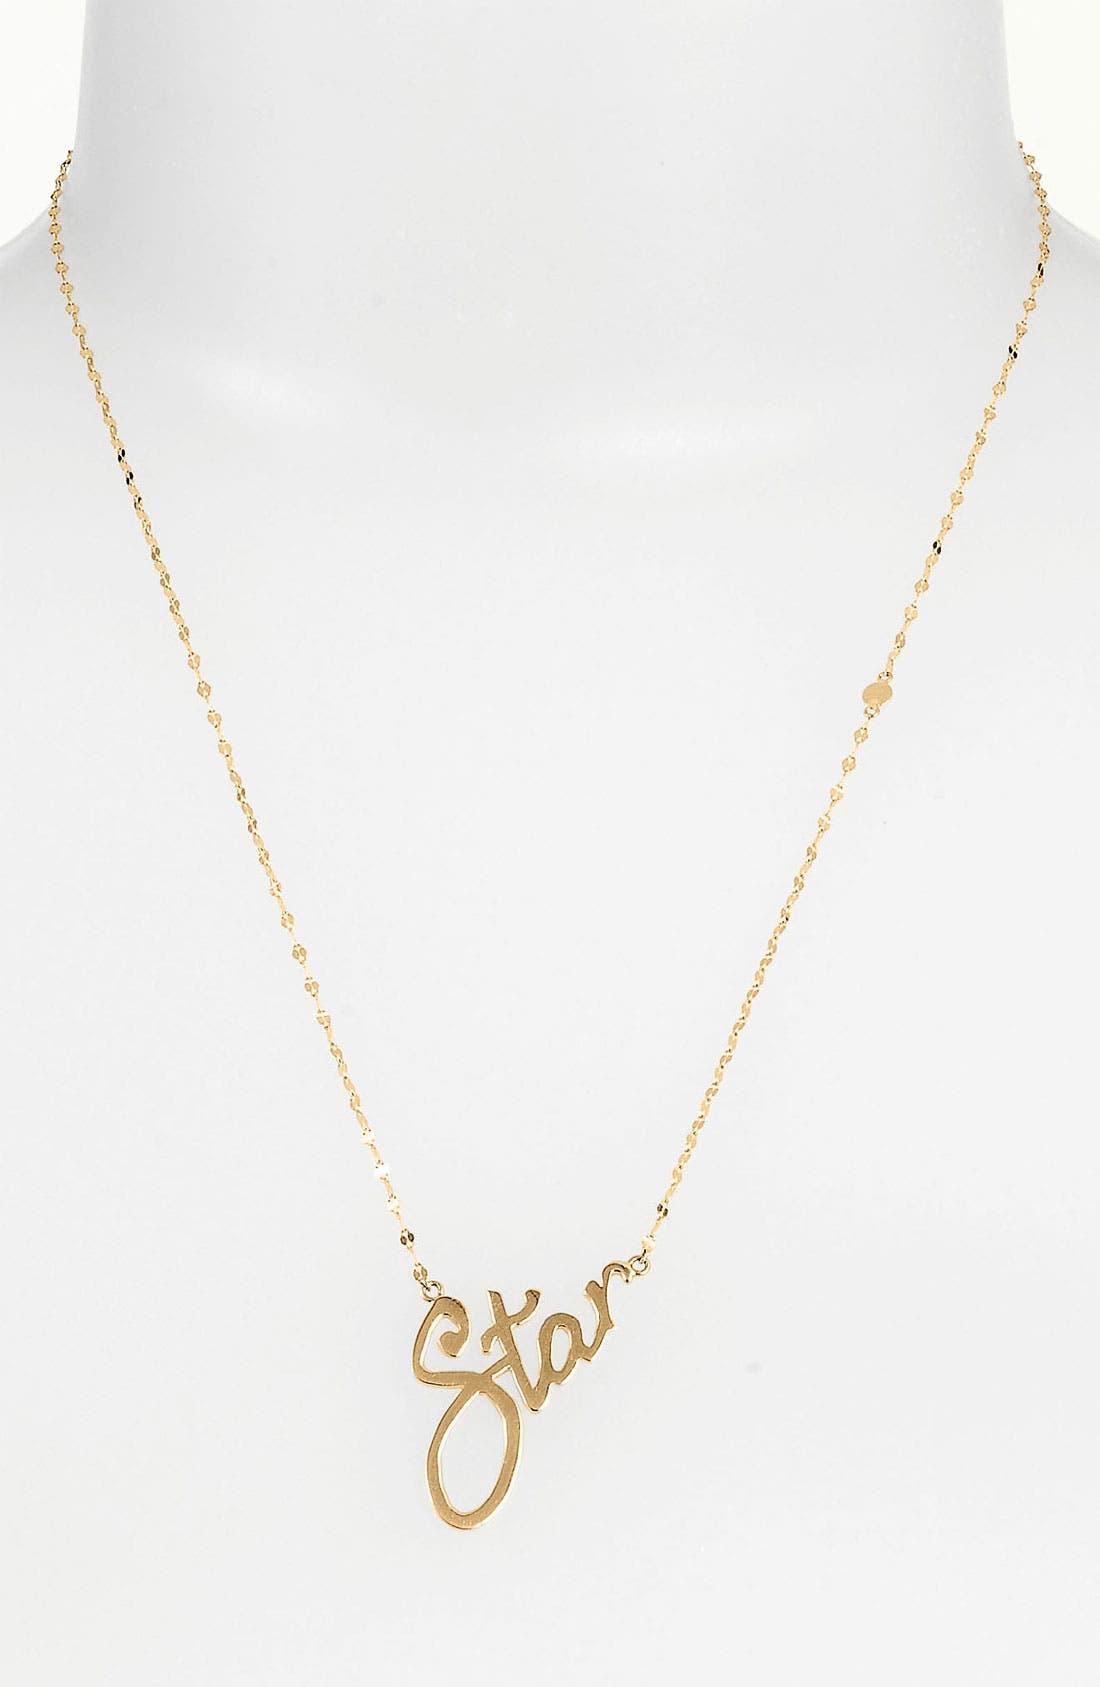 Main Image - Lana Jewelry 'Star' Charm Necklace